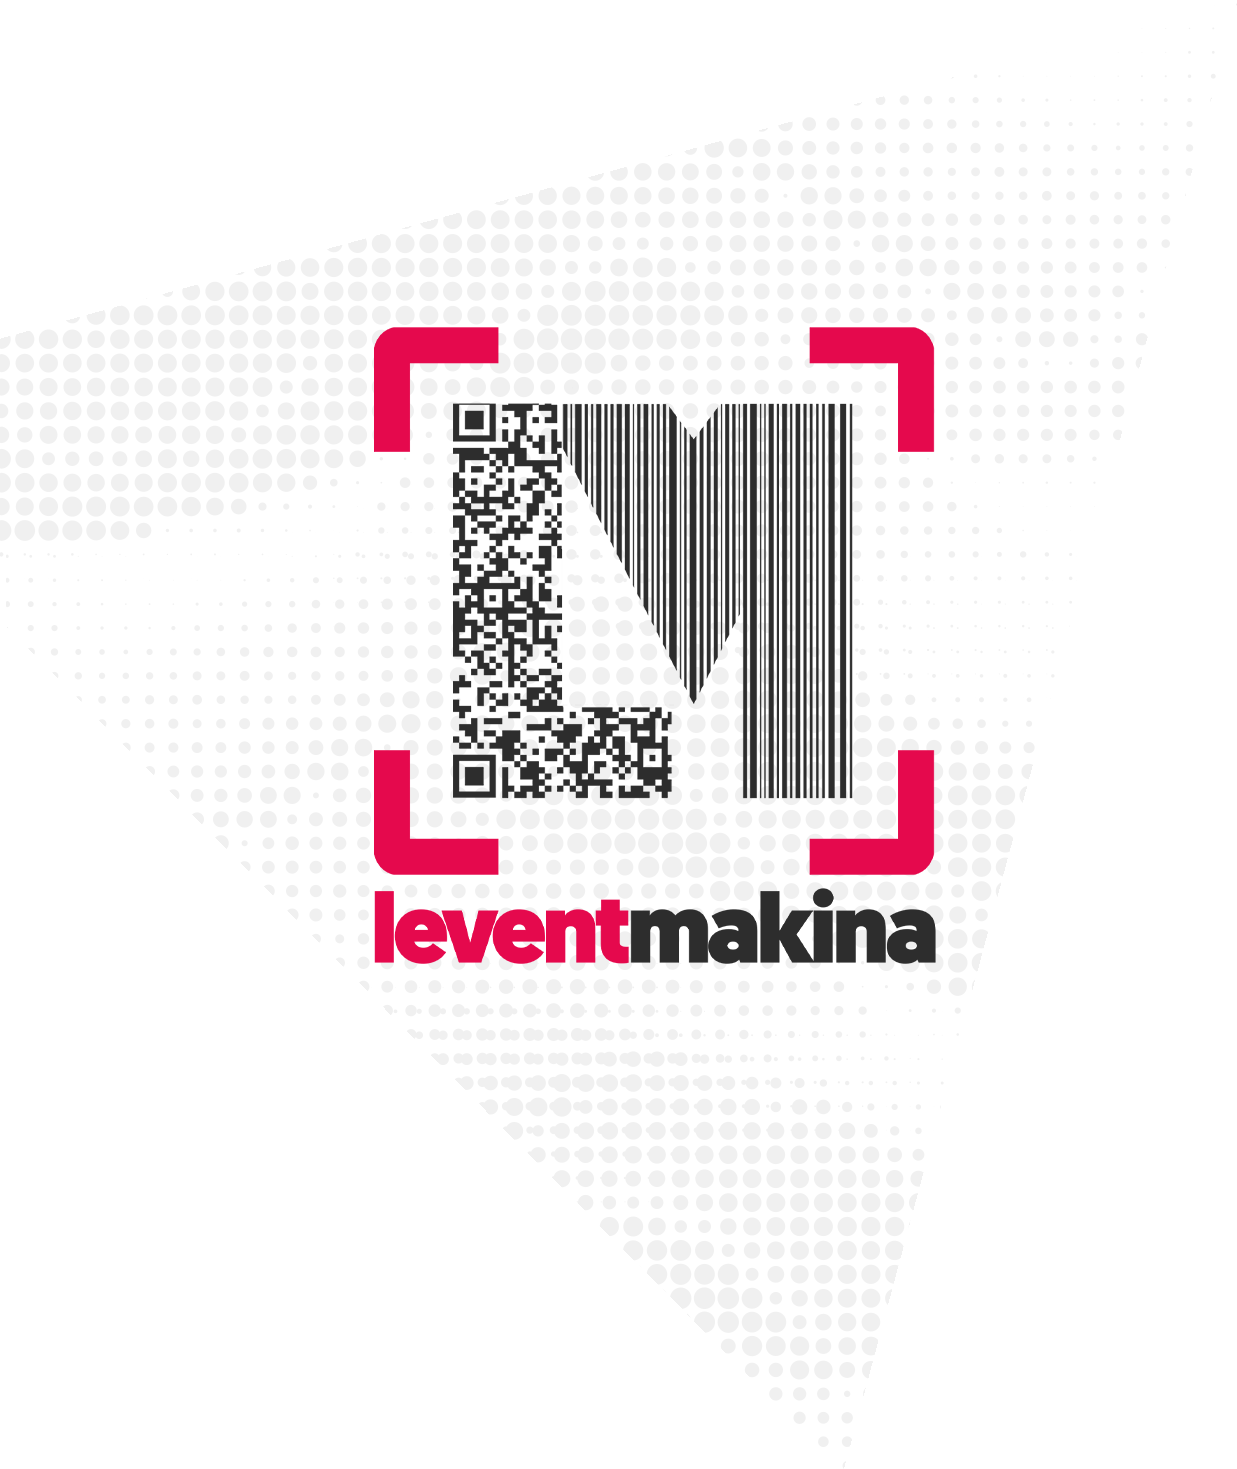 https://leventmachine.com/wp-content/uploads/2019/11/logo-1.png